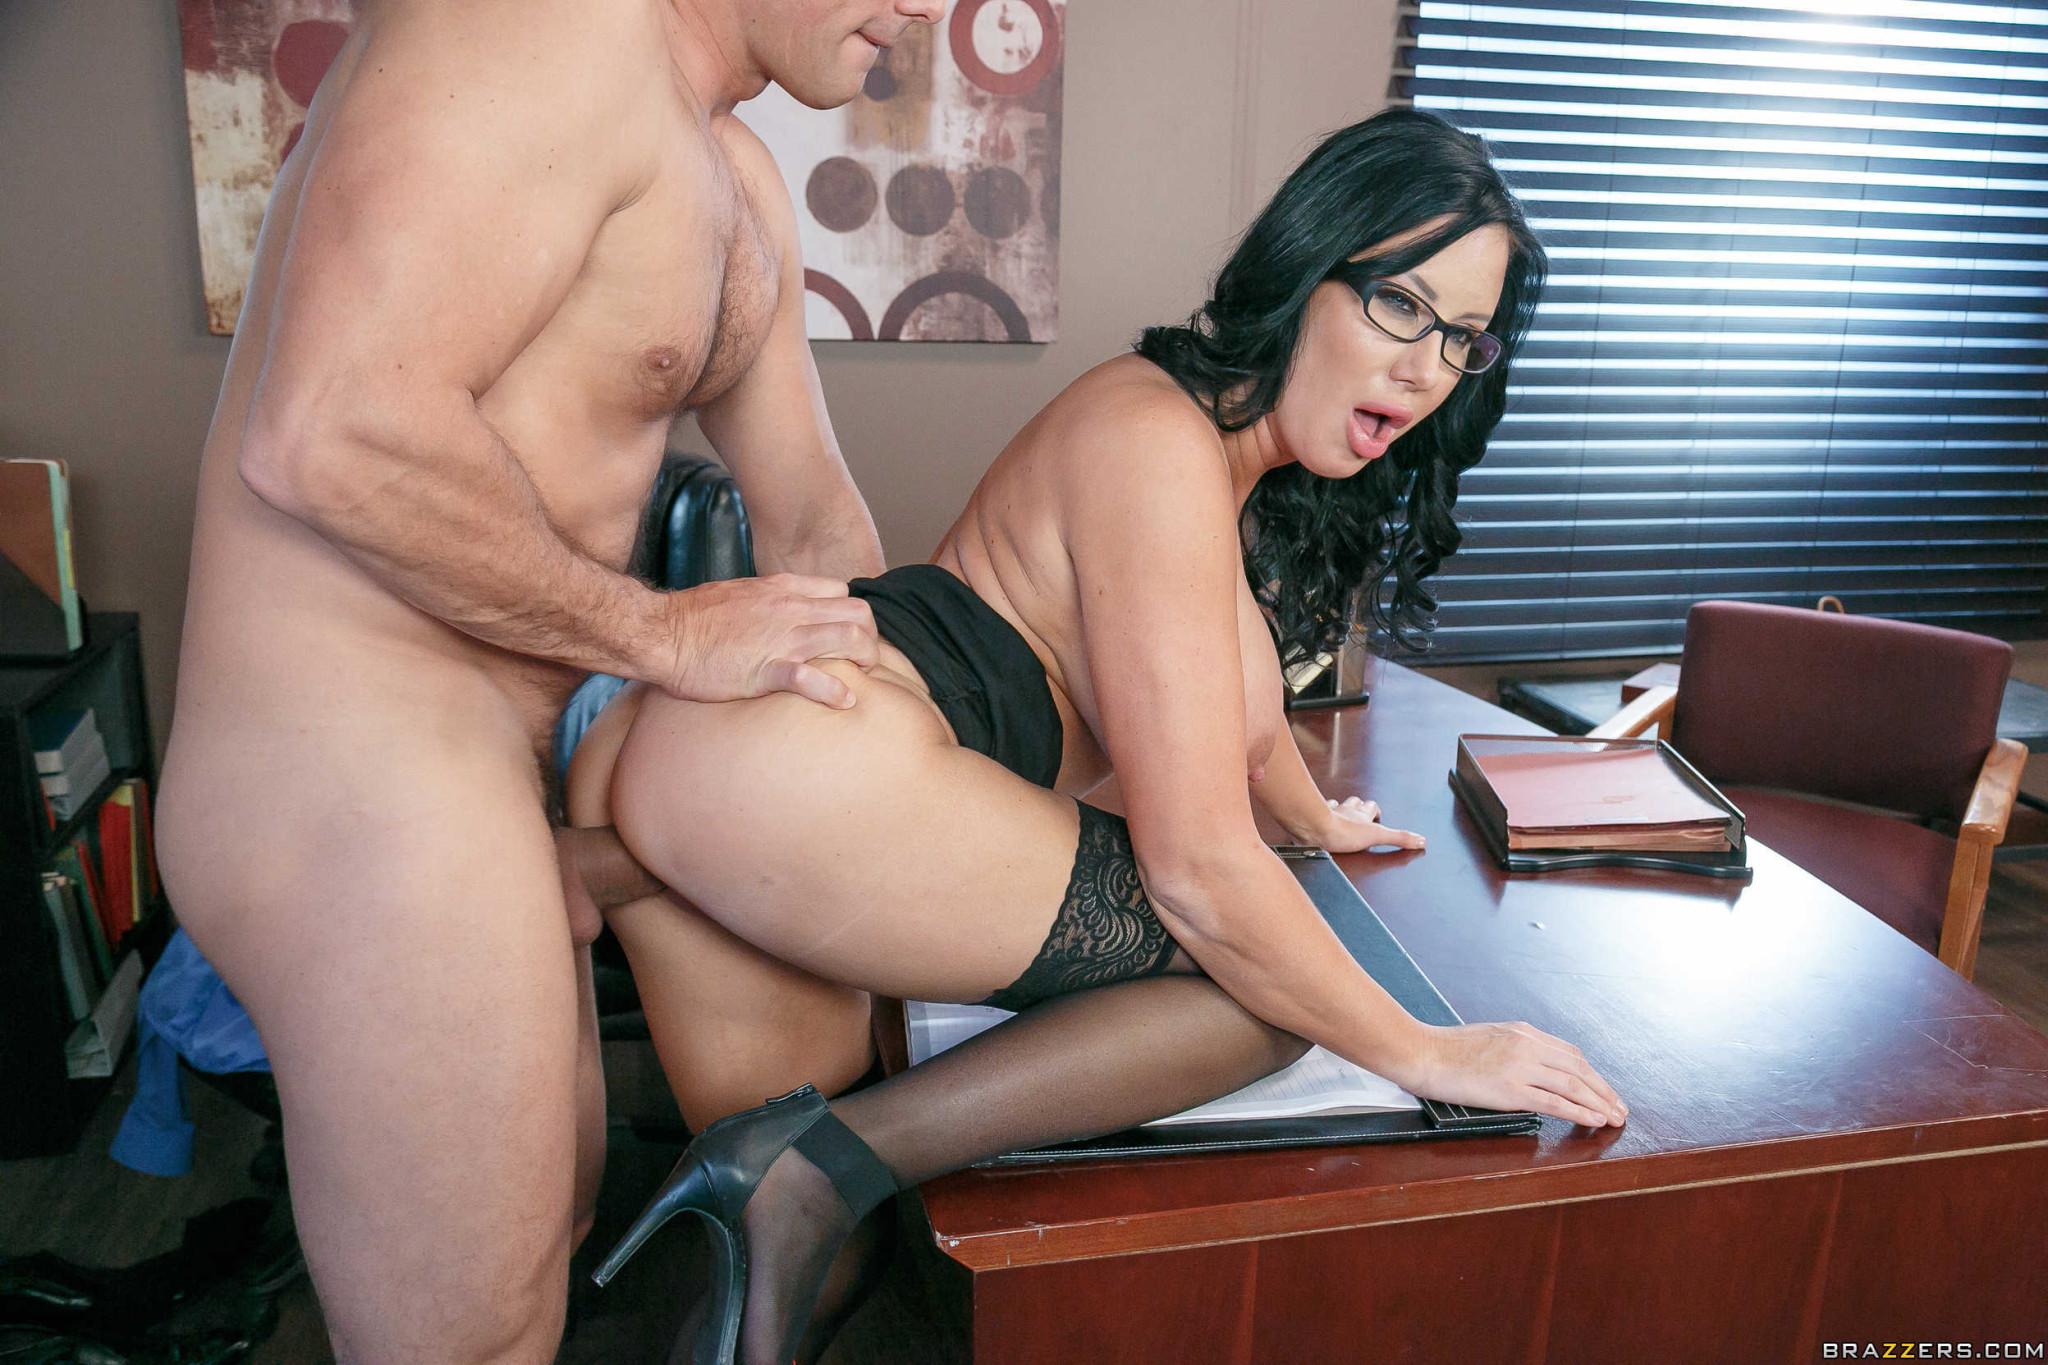 Секретарши готовы на всё порно, Готовые на все секретарши Secretaires Pretes A Tout 4 фотография